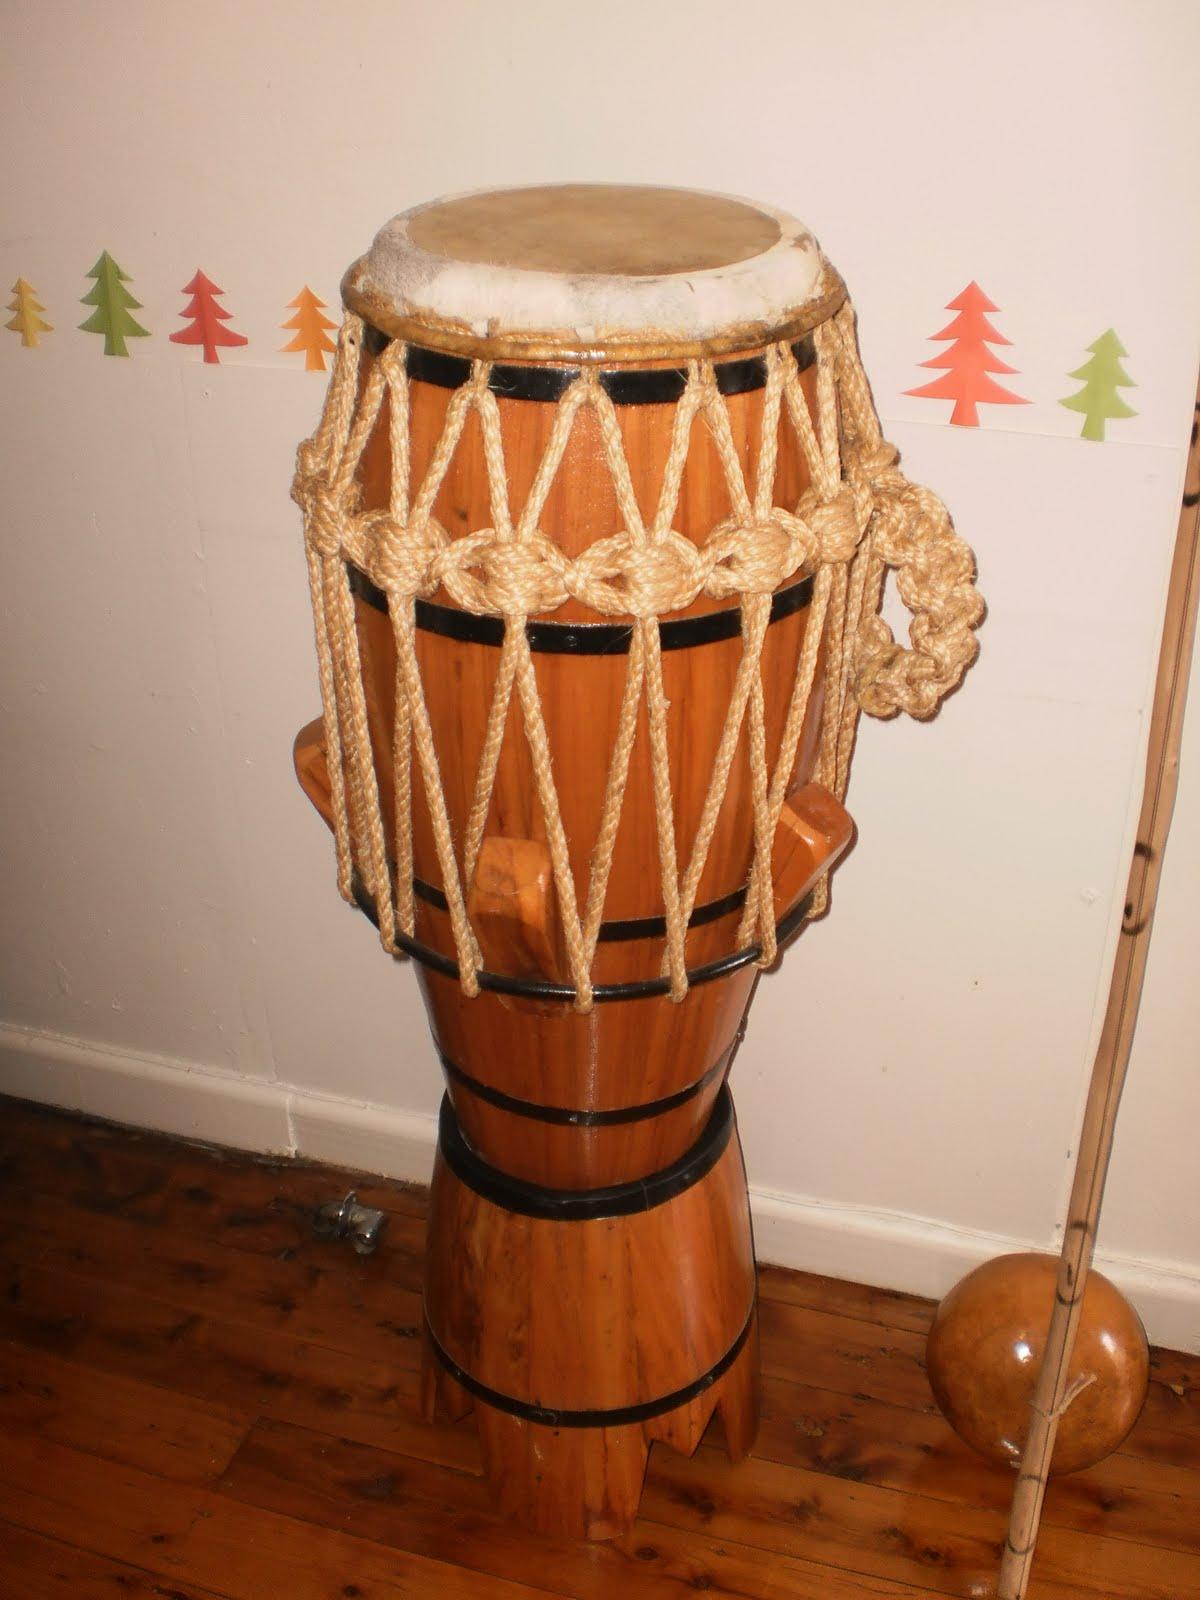 aberr capoeira instrumentos venda instruments to sell. Black Bedroom Furniture Sets. Home Design Ideas